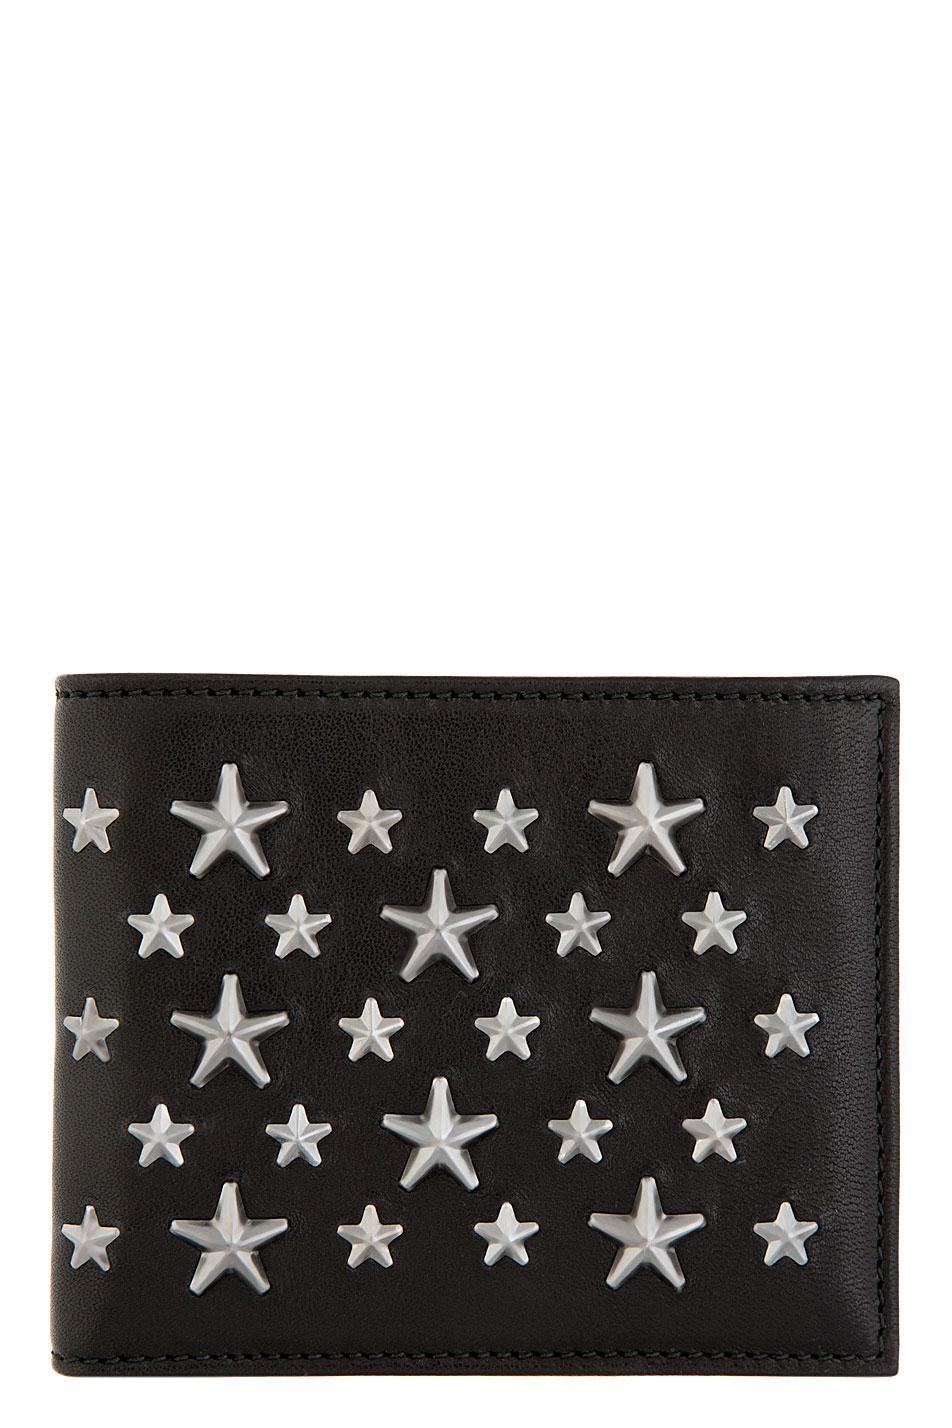 Jimmy choo black star_ studded mark bifold wallet